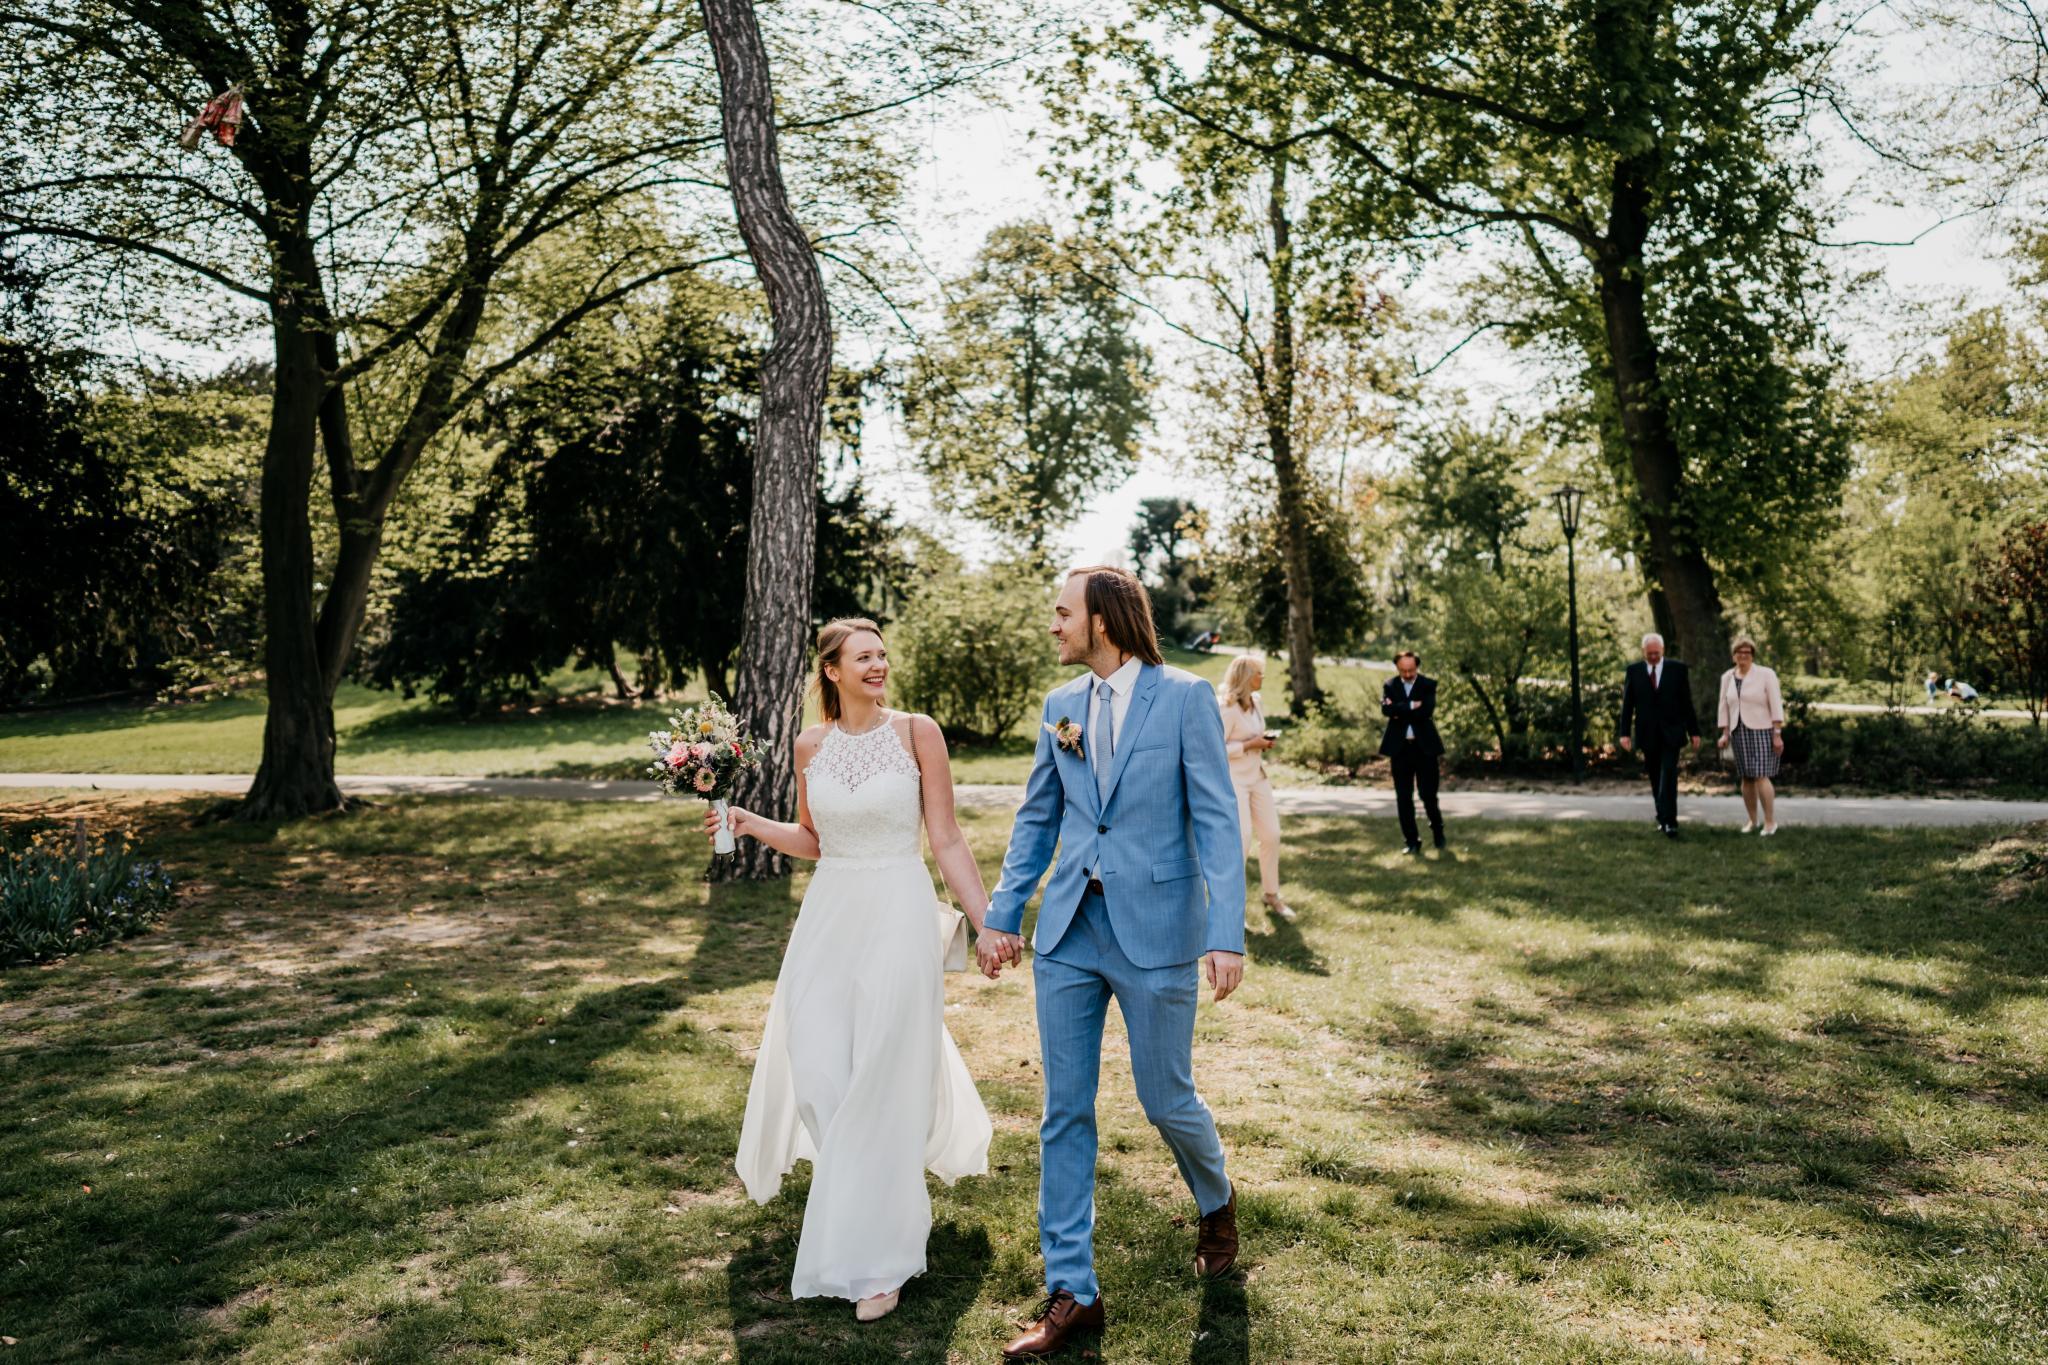 Eine Hochzeit trotz Corona